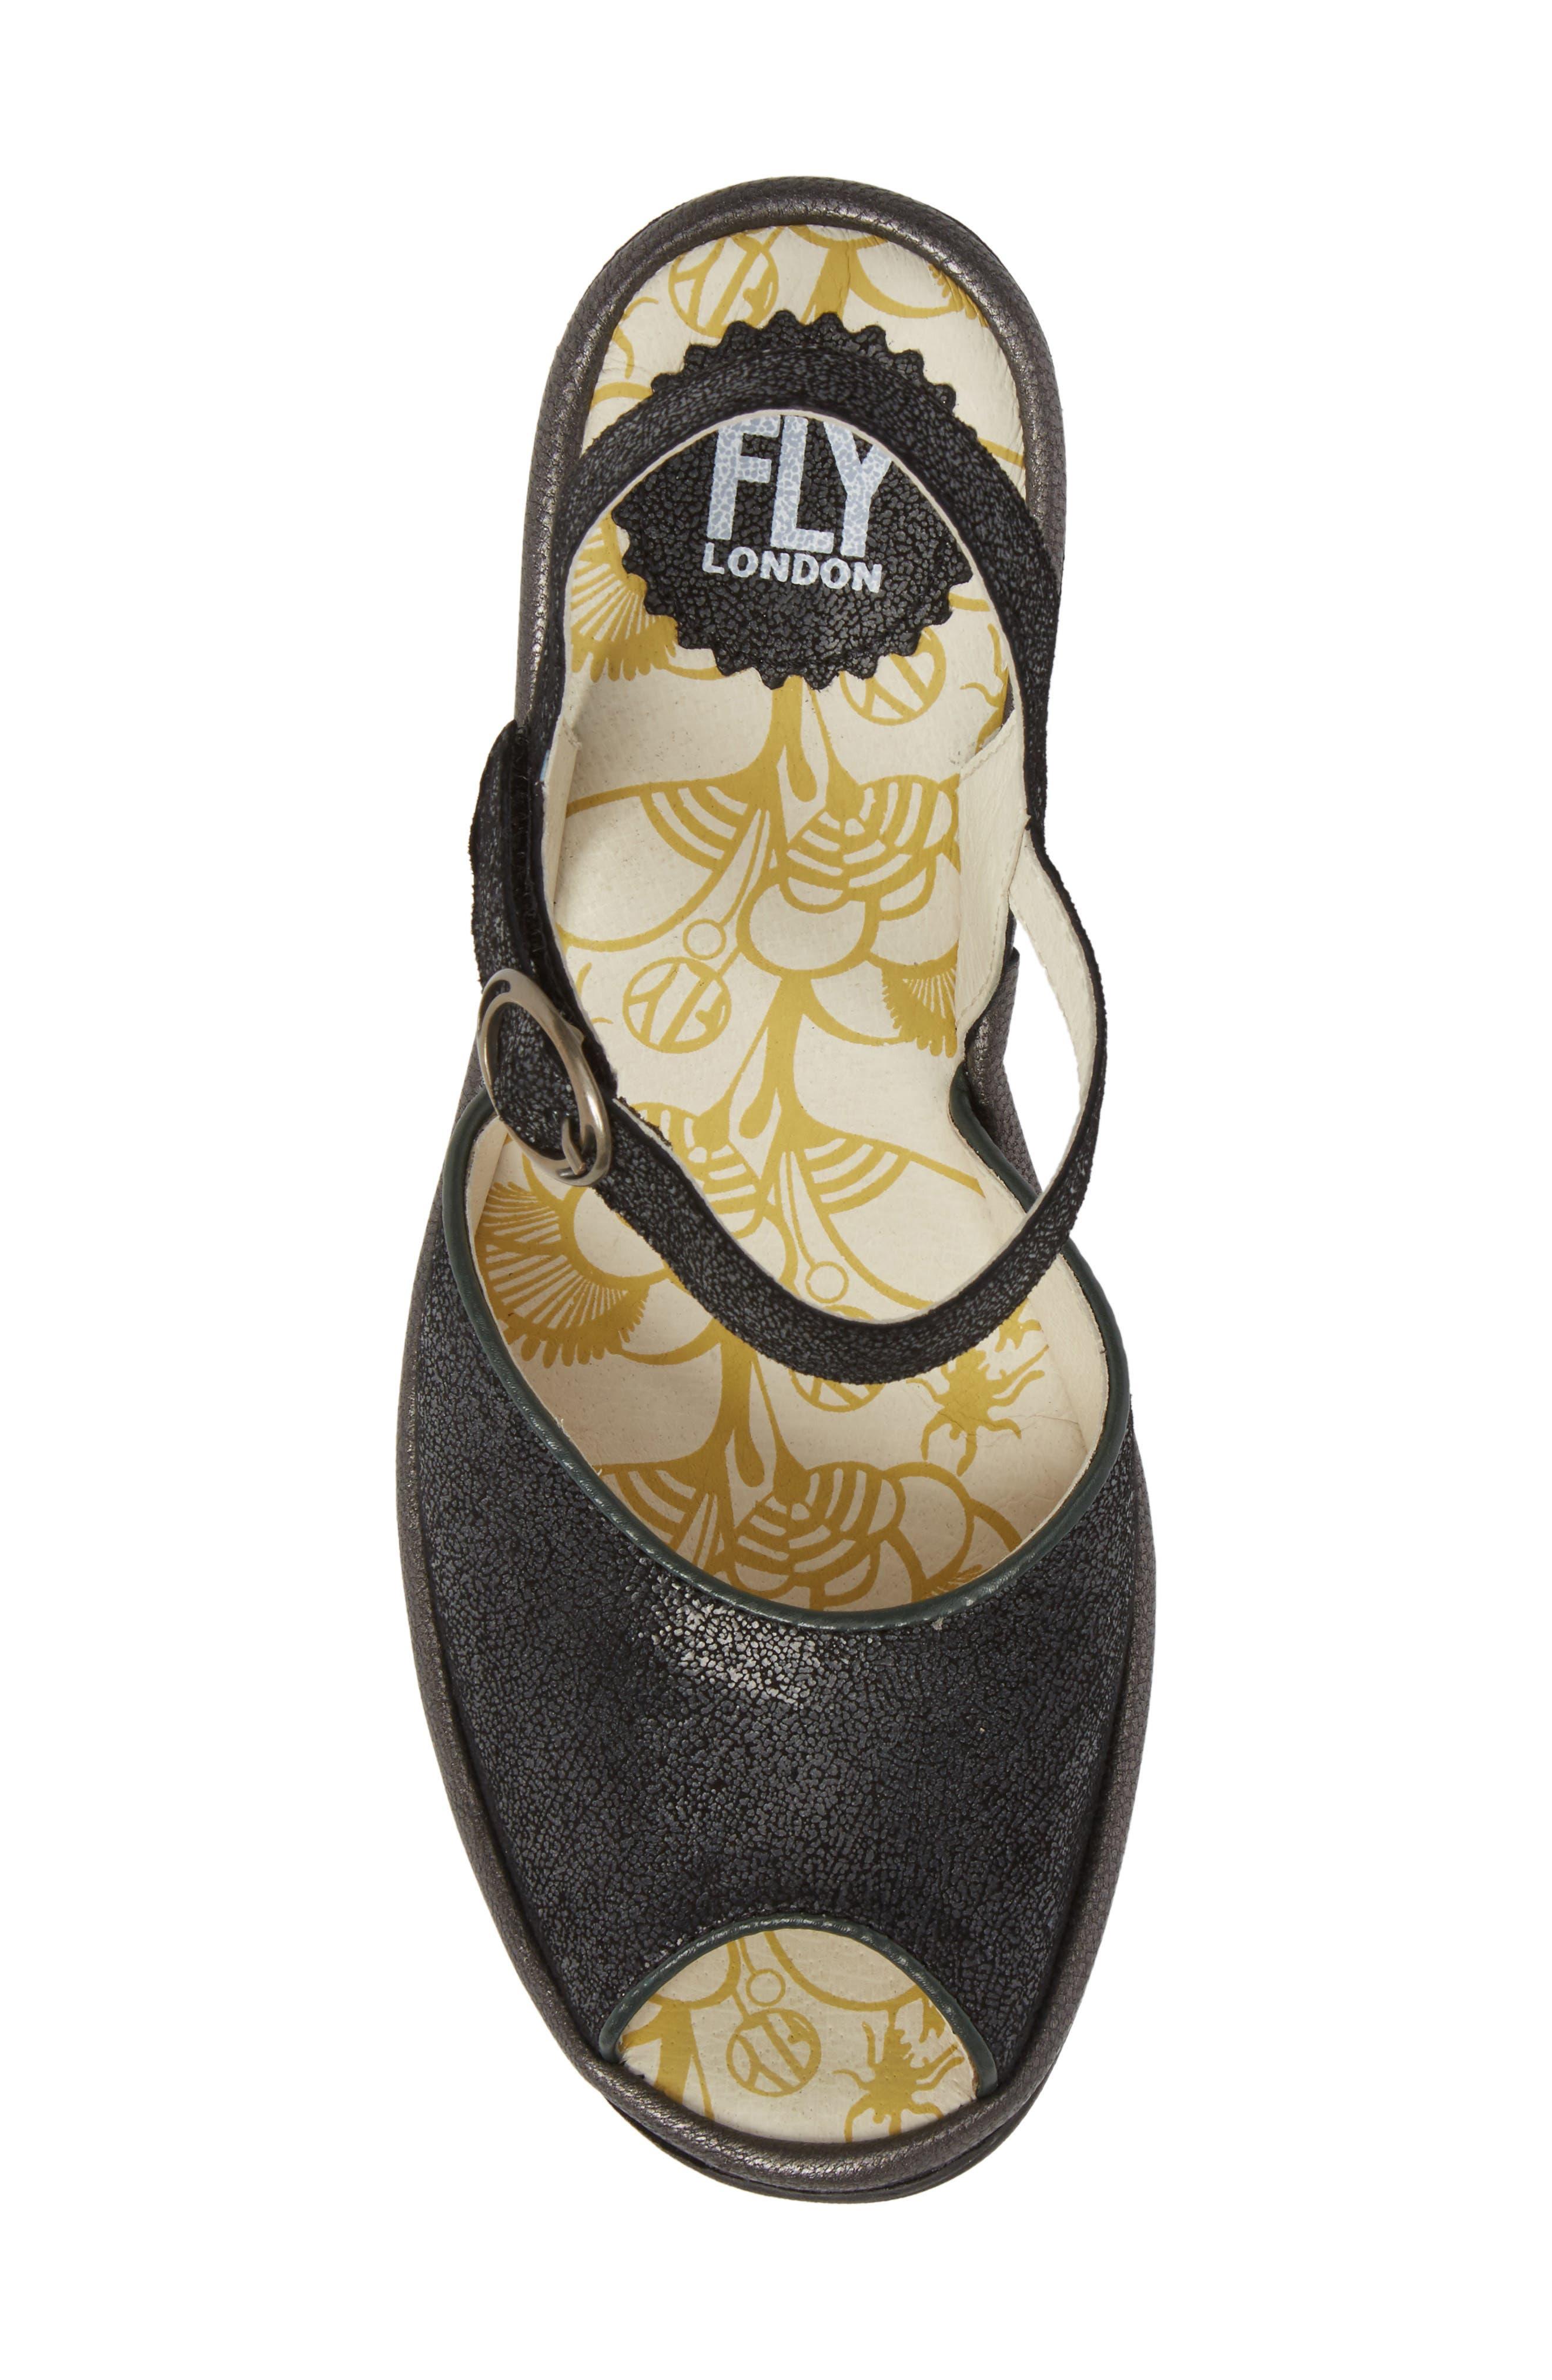 FLY LONDON, Yora Wedge Sandal, Alternate thumbnail 5, color, BLACK/ GRAPHITE LEATHER